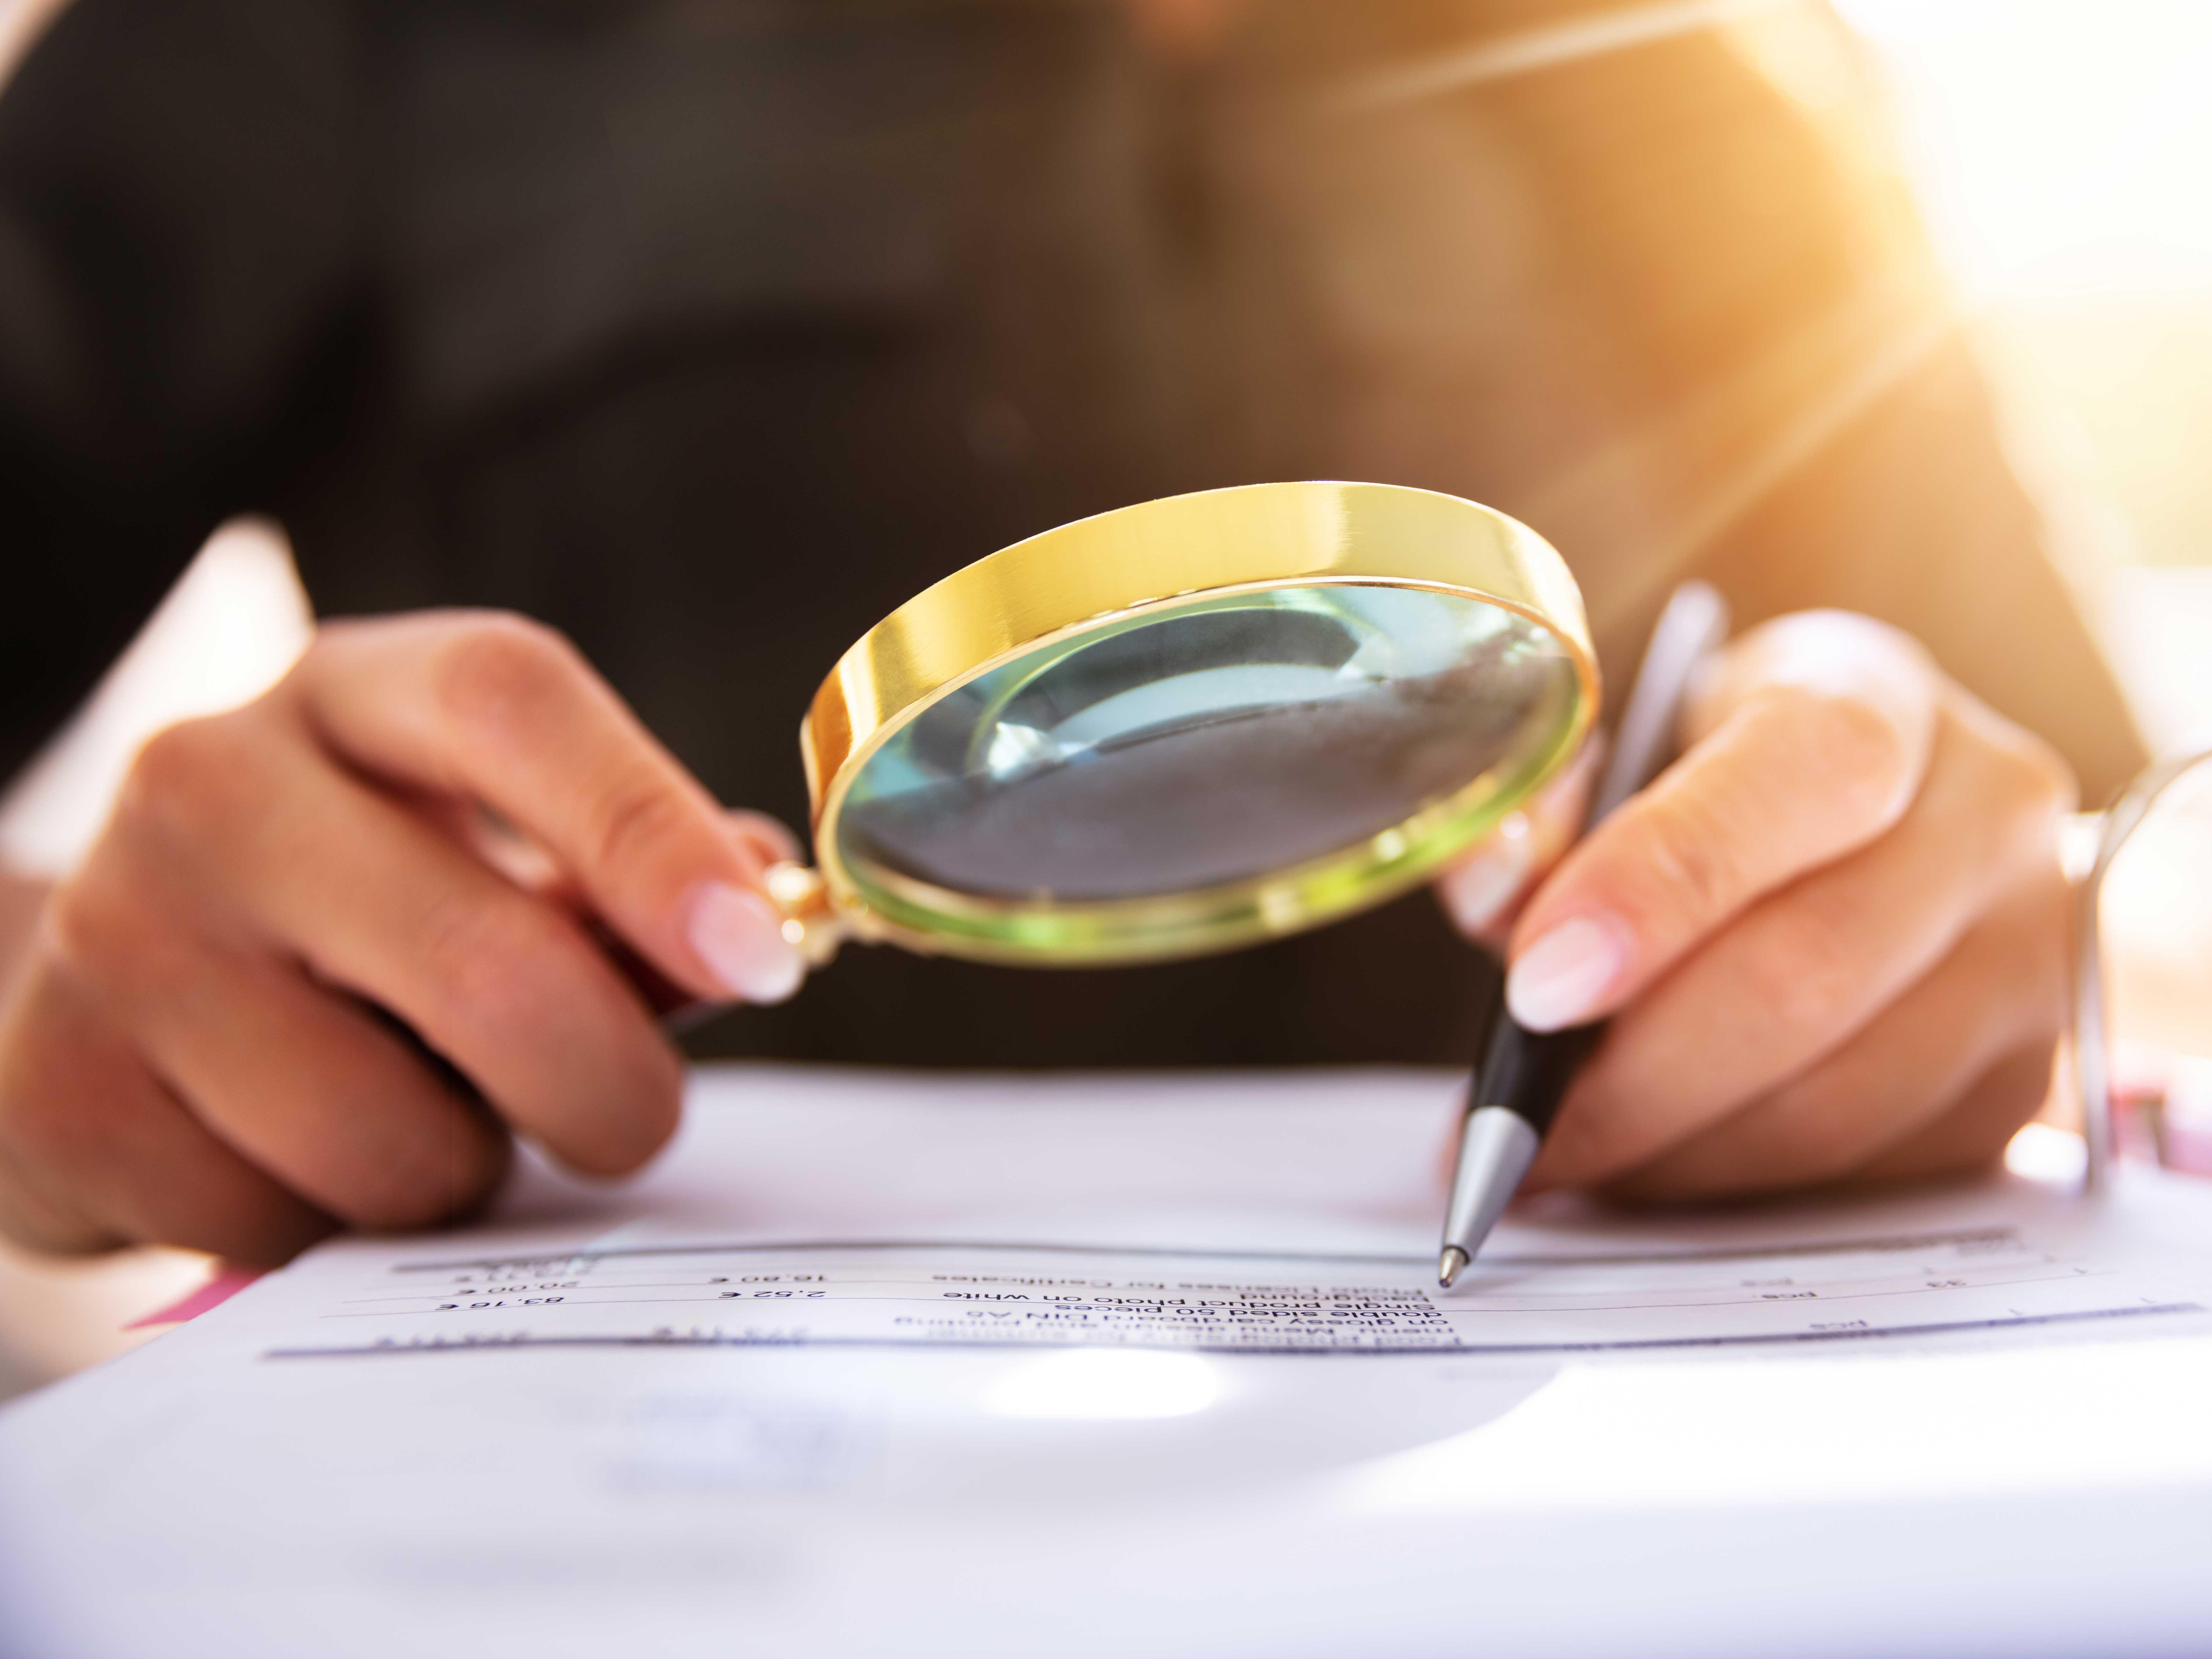 The Australian Government turns its spotlight on Regulators